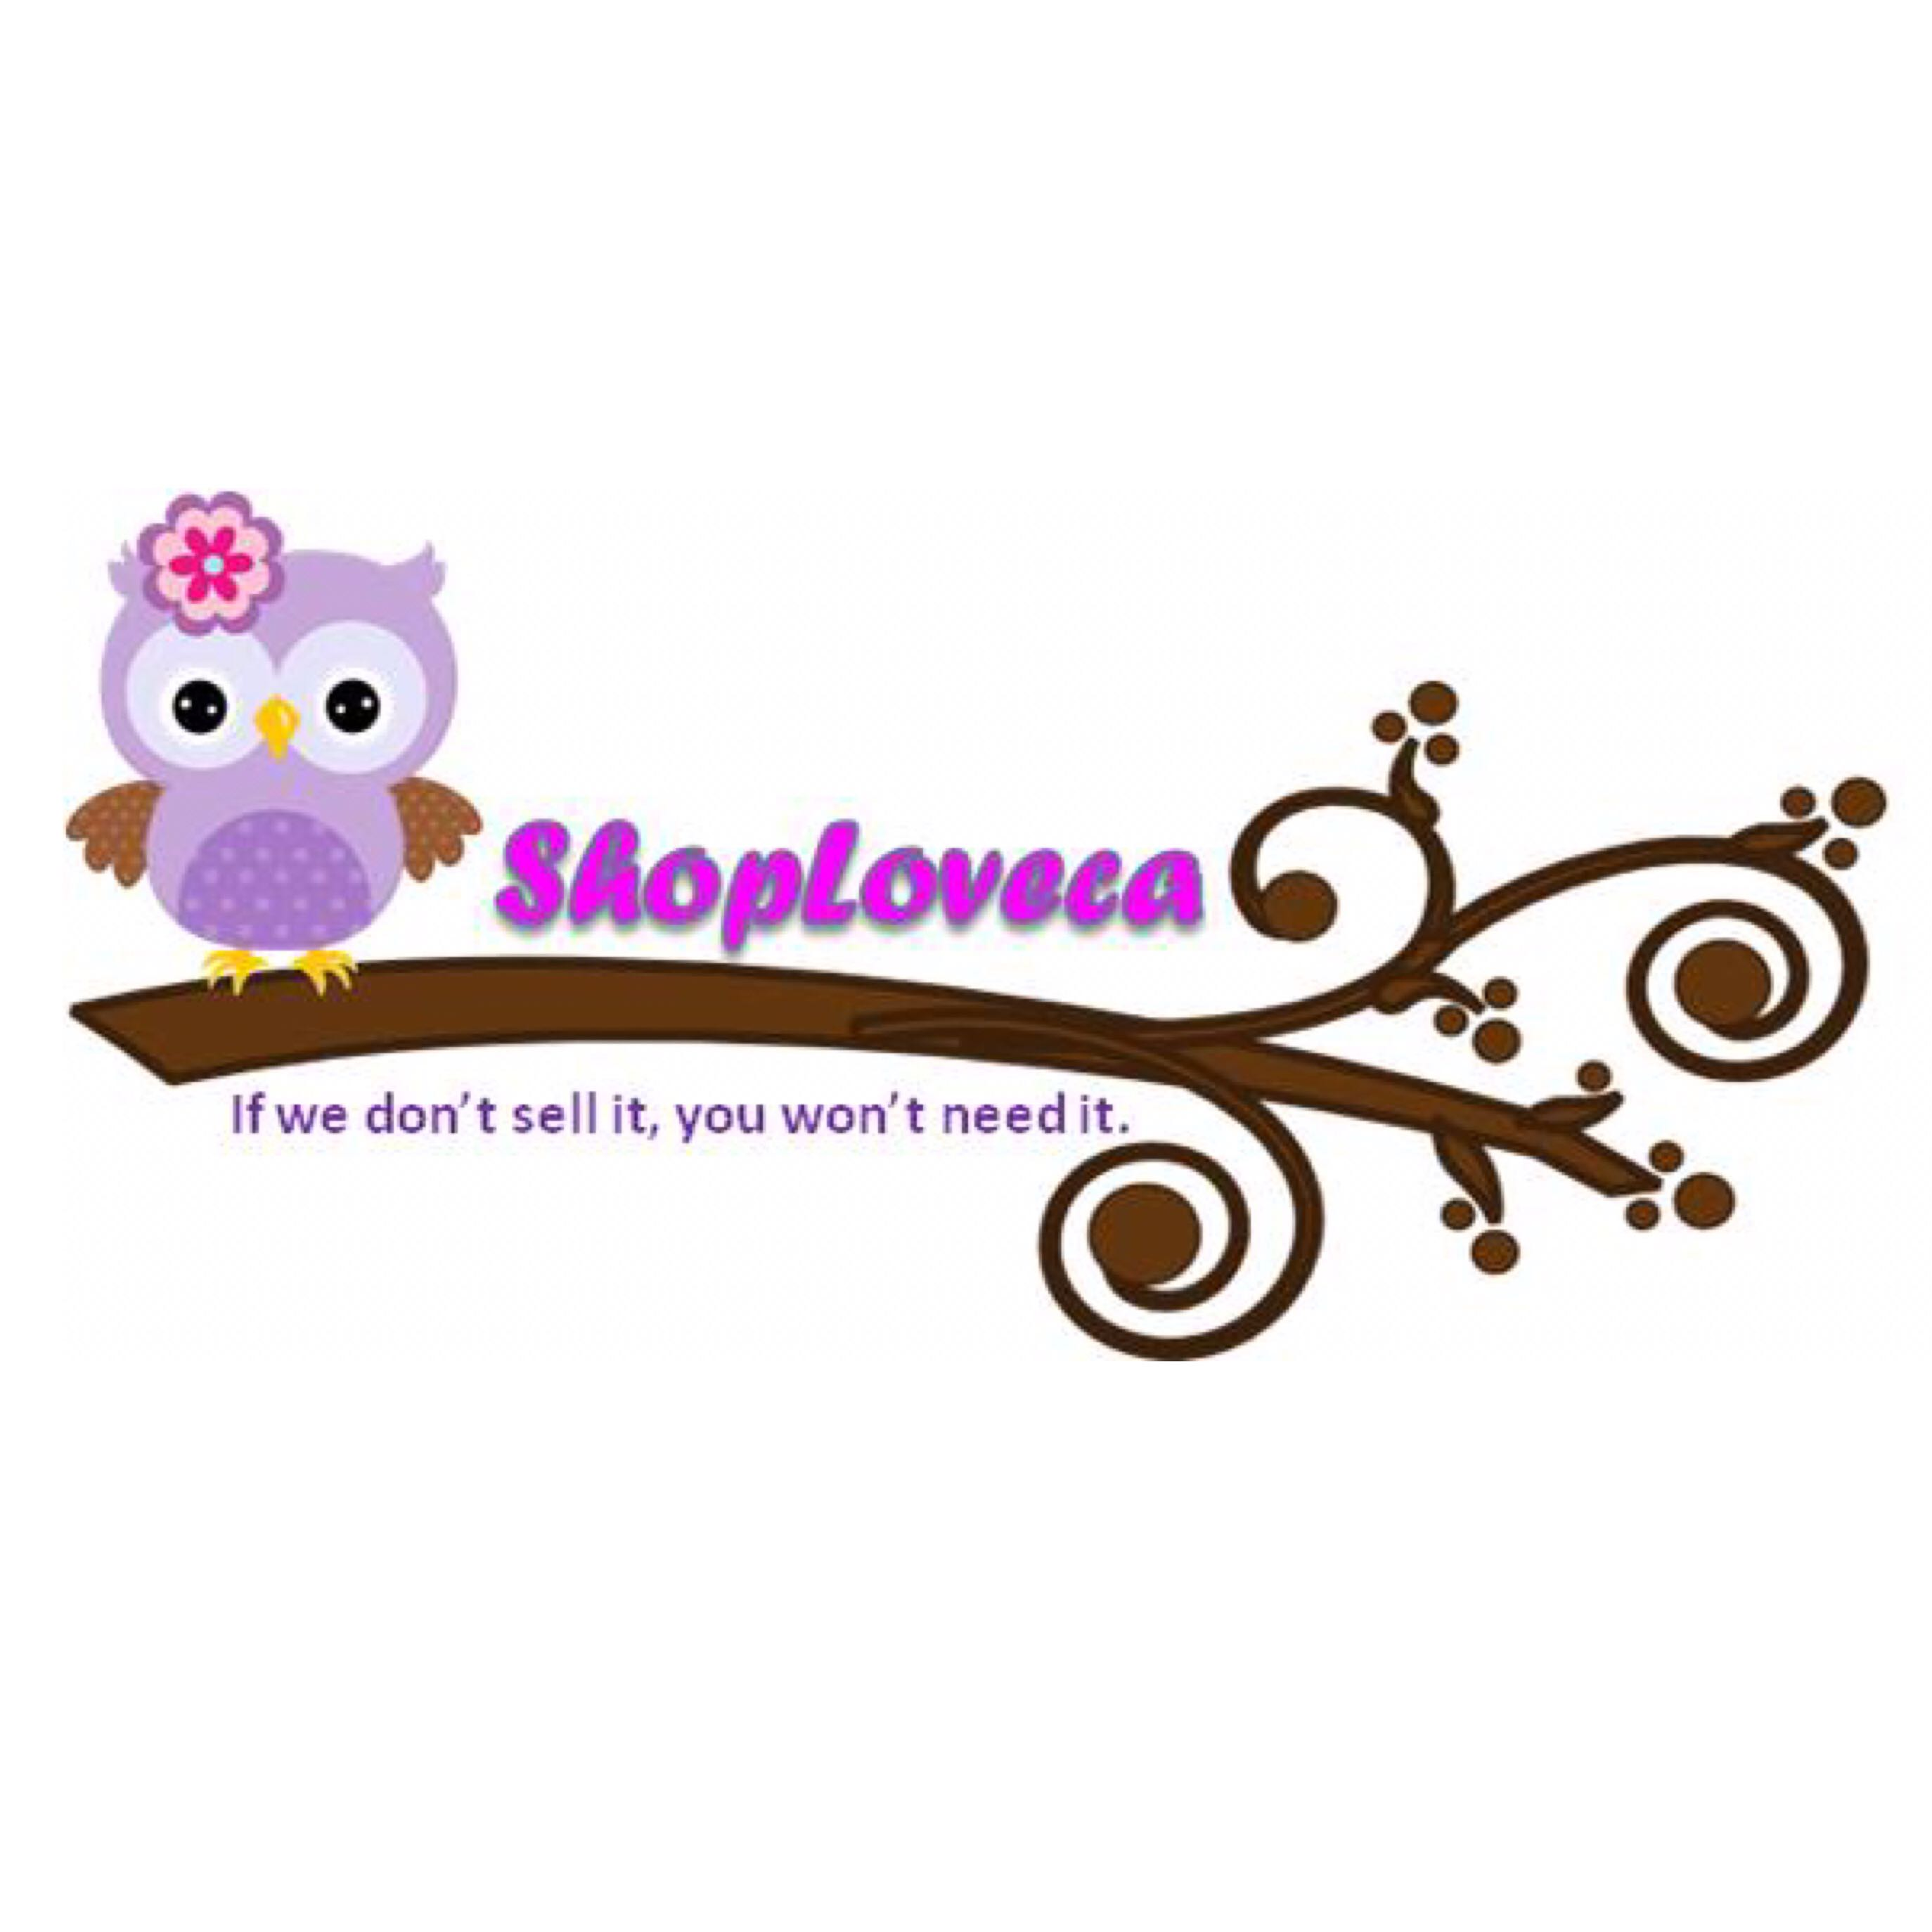 shoploveca